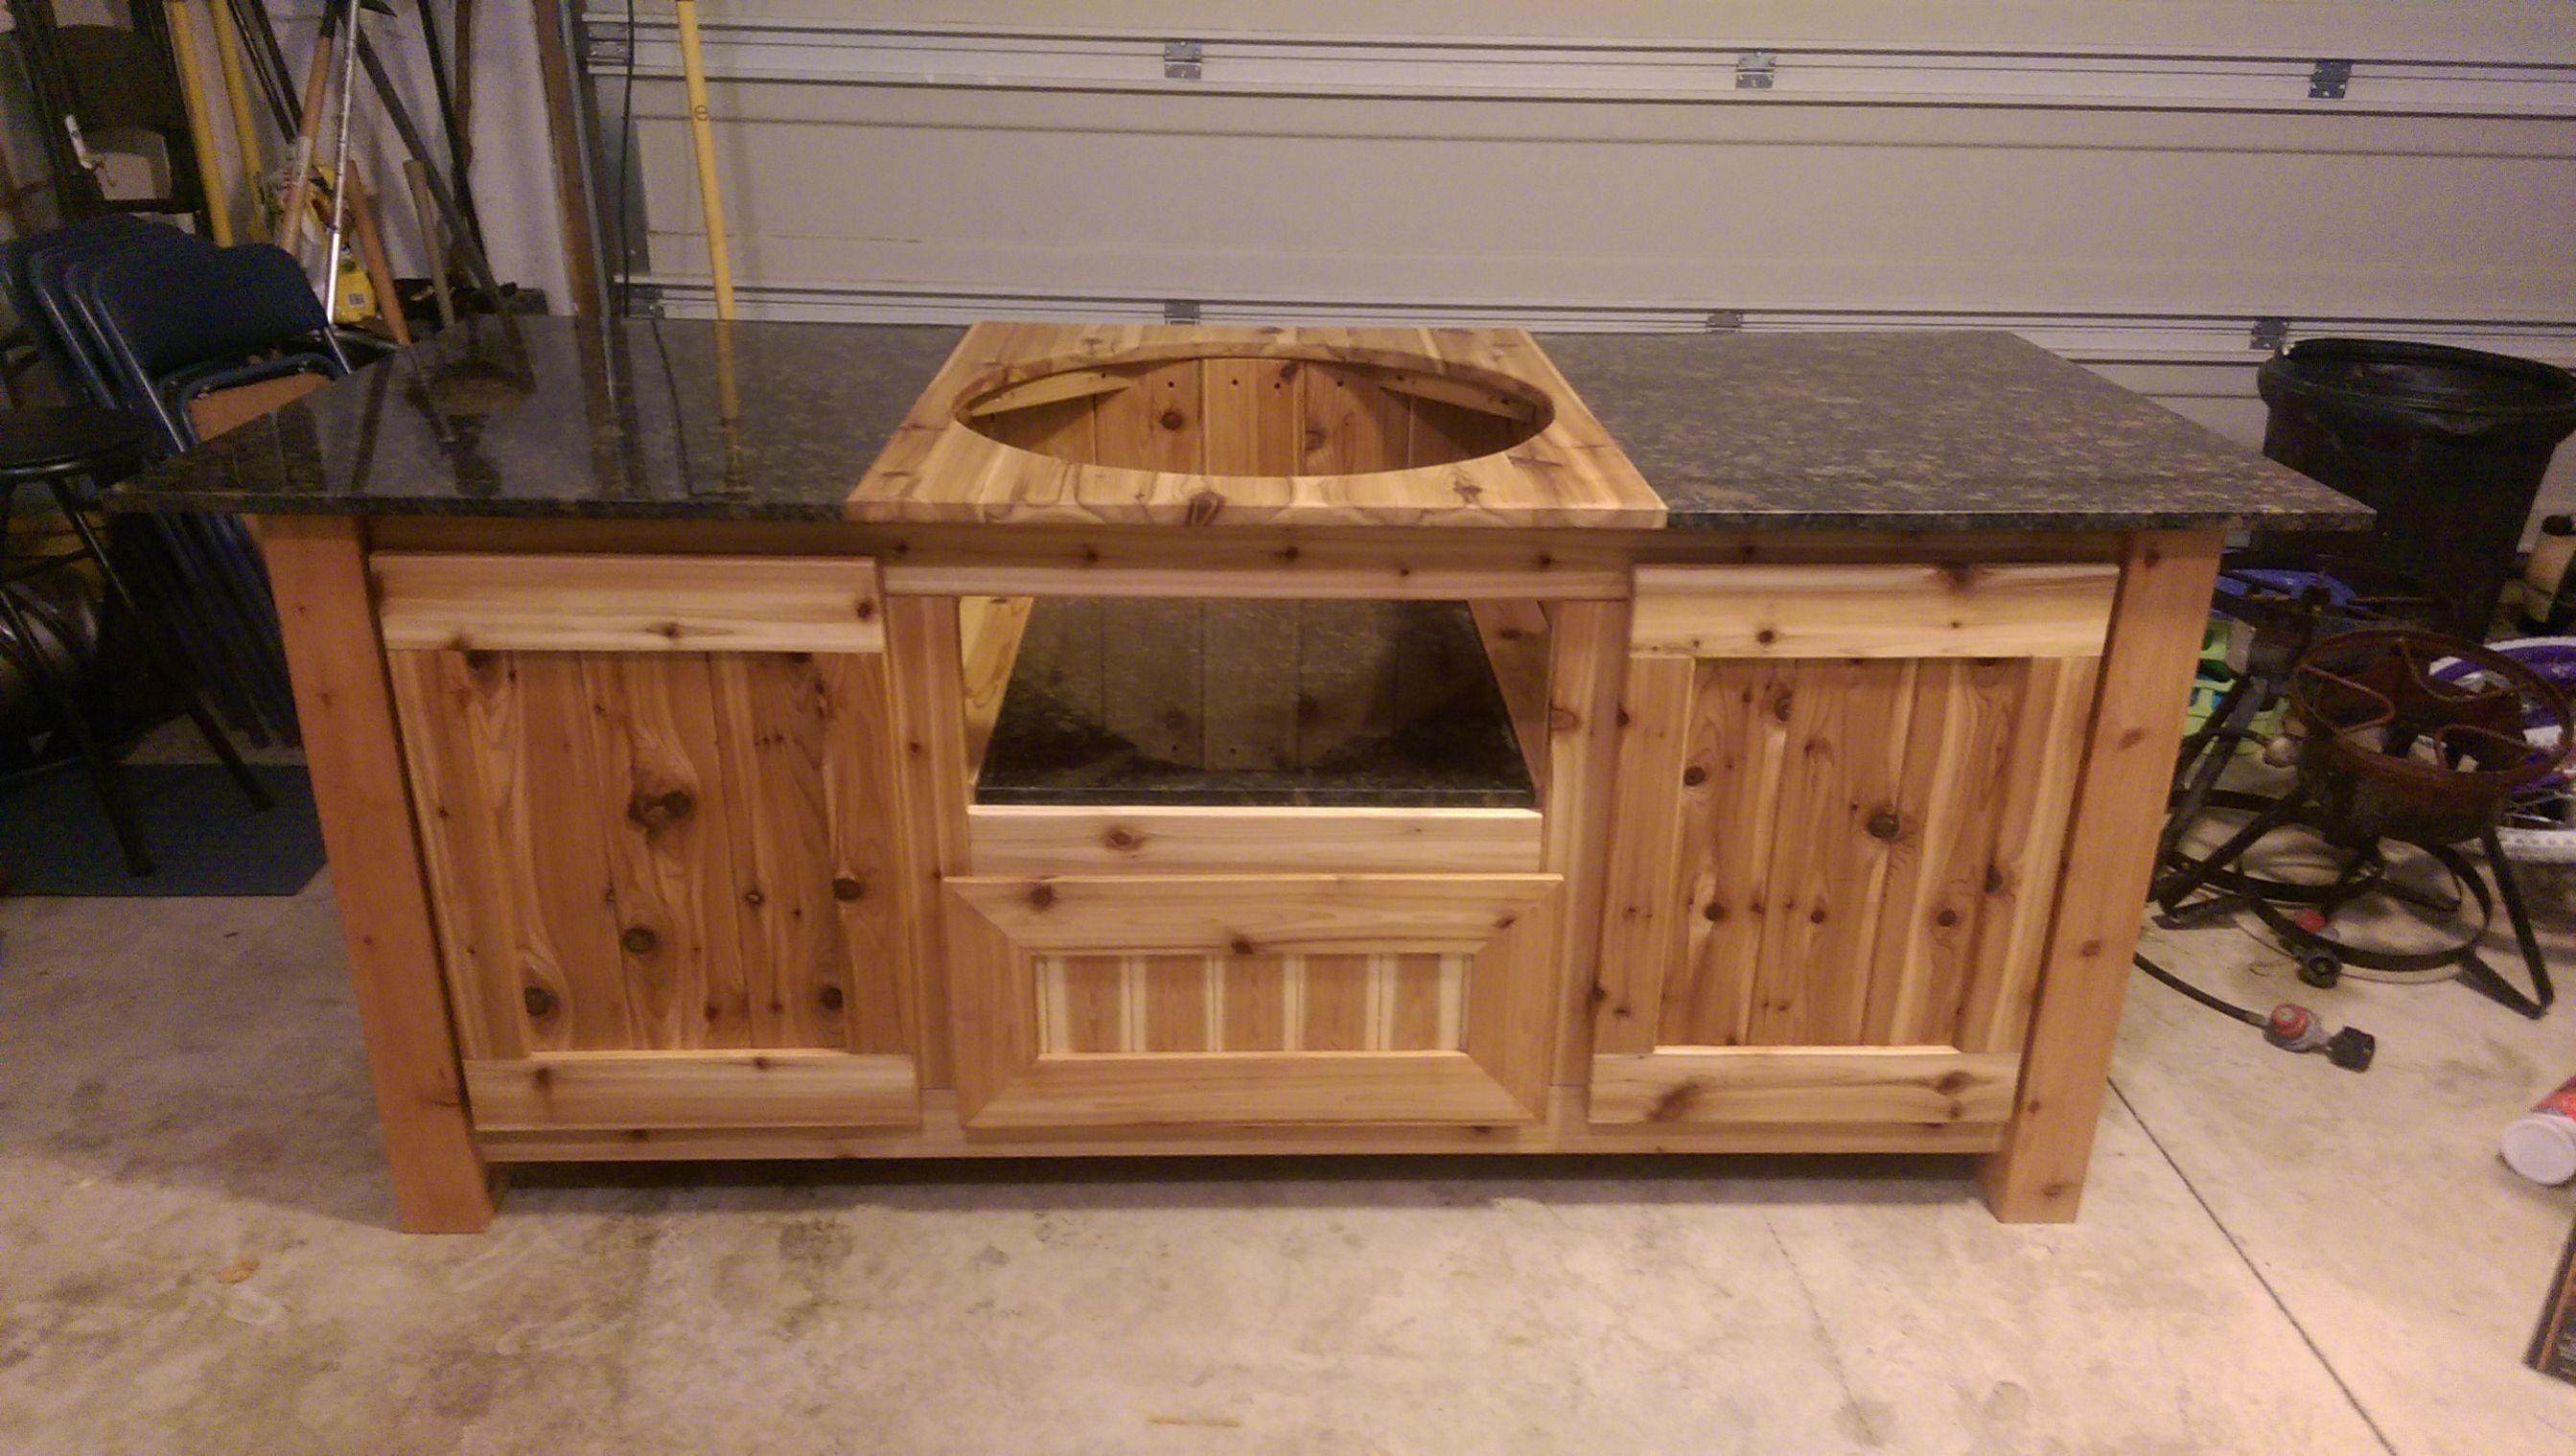 Big Green Egg Table Plans Toddler Beds For Girls Moen Kitchen Faucet Parts